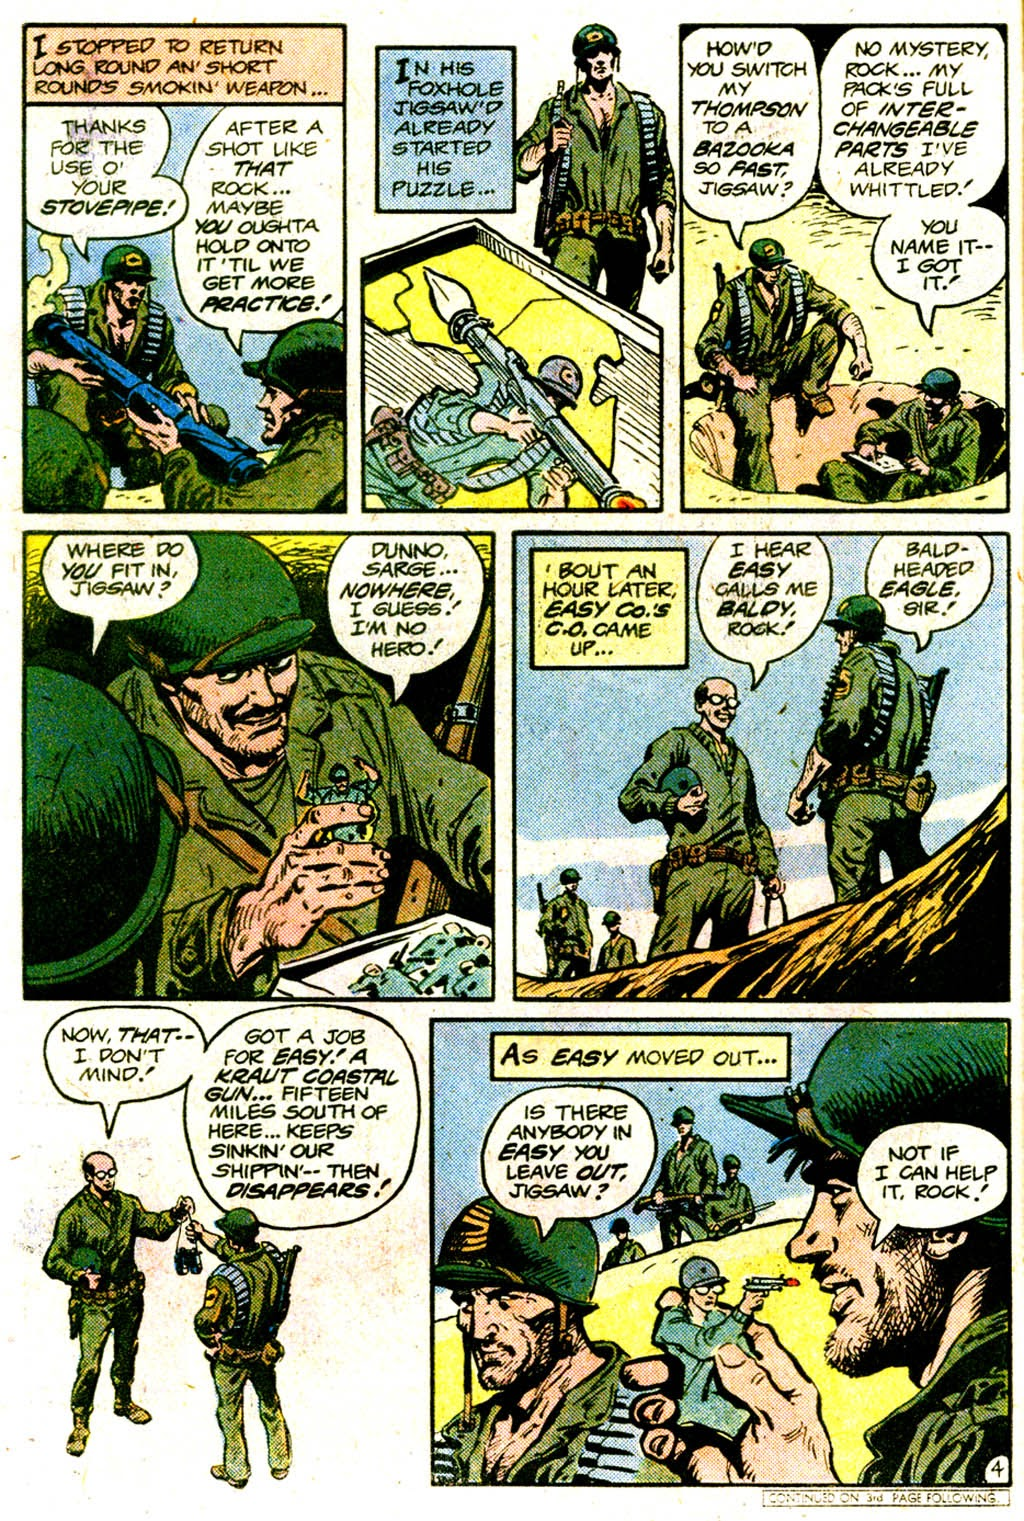 Read online Sgt. Rock comic -  Issue #365 - 5